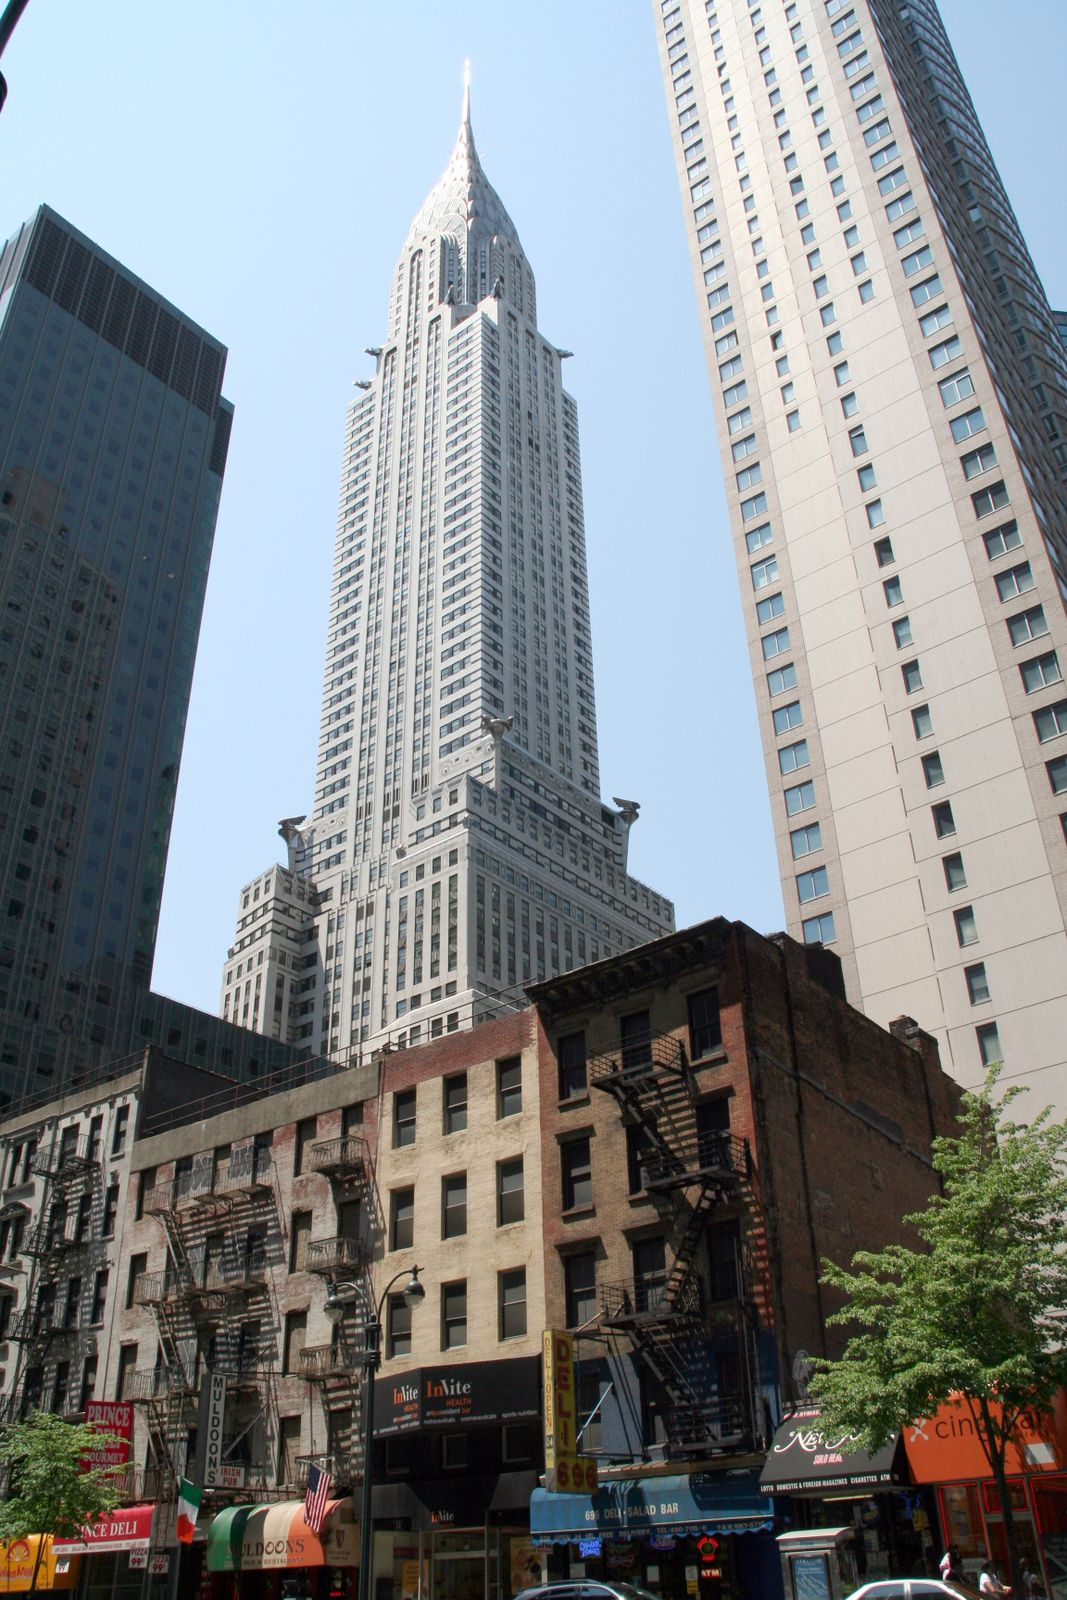 High buildings in New York